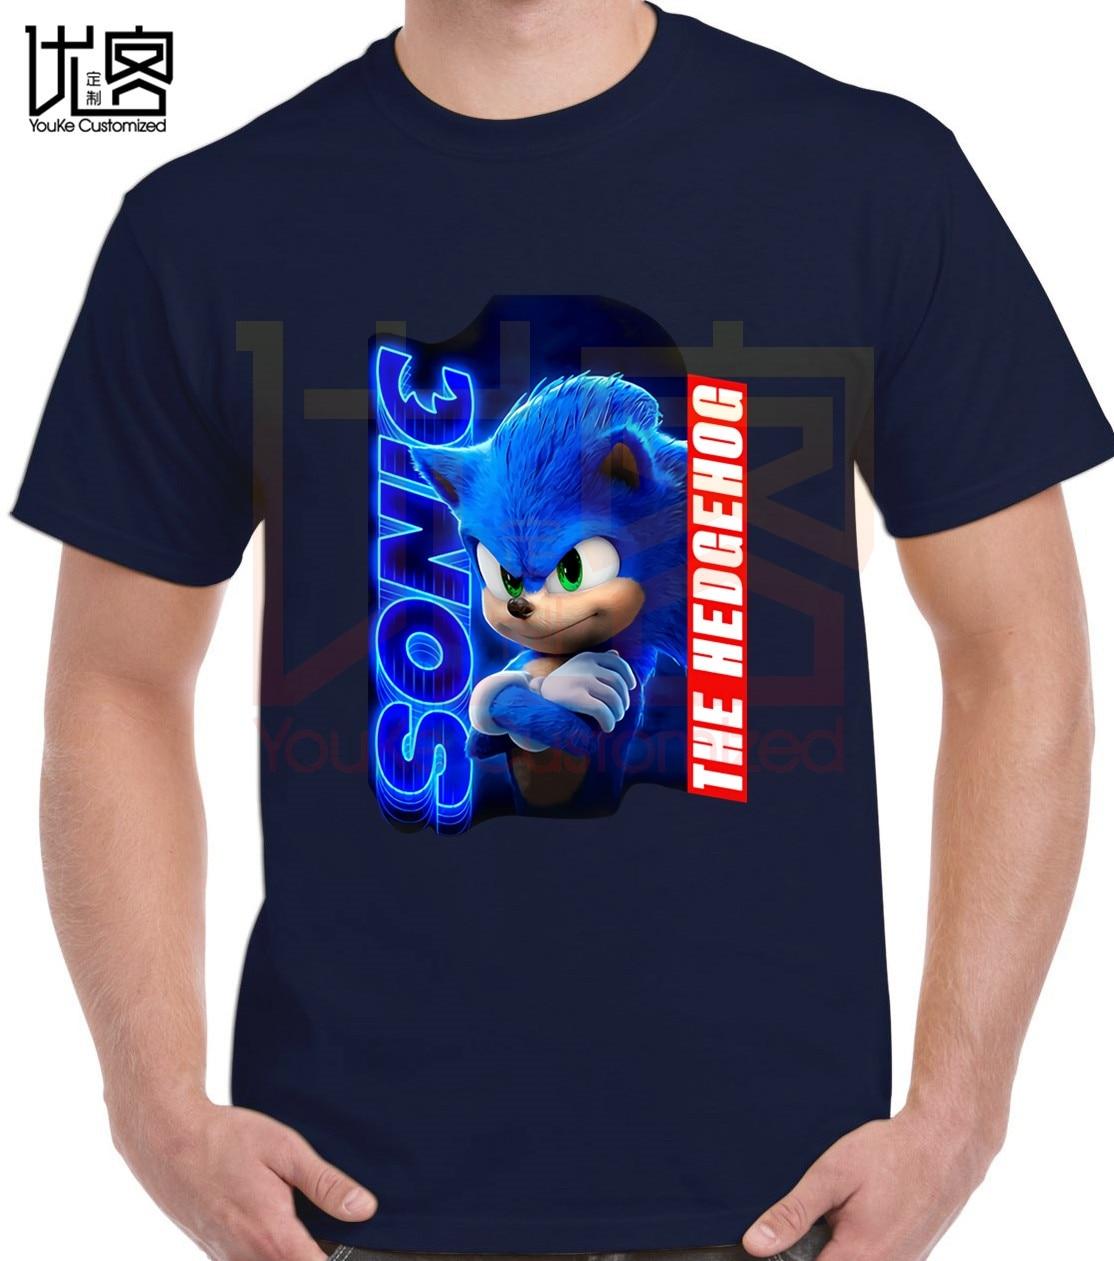 New Sonic The Hedgehog Movie 2020 Unisex T Shirt Logo Design